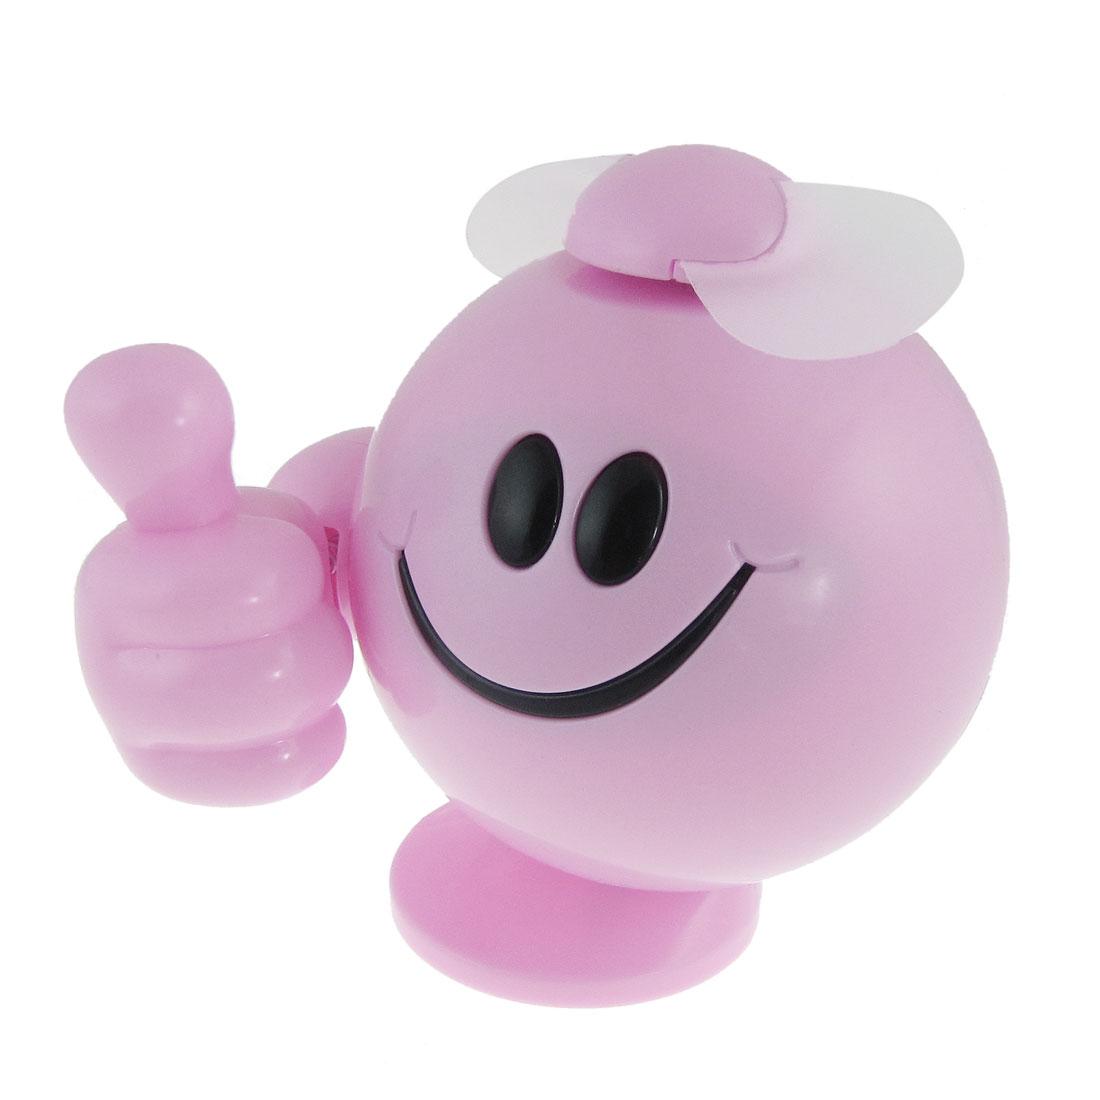 Cartoon Thumb Figure 2 AAA Battery Operated Mini Fan Pink